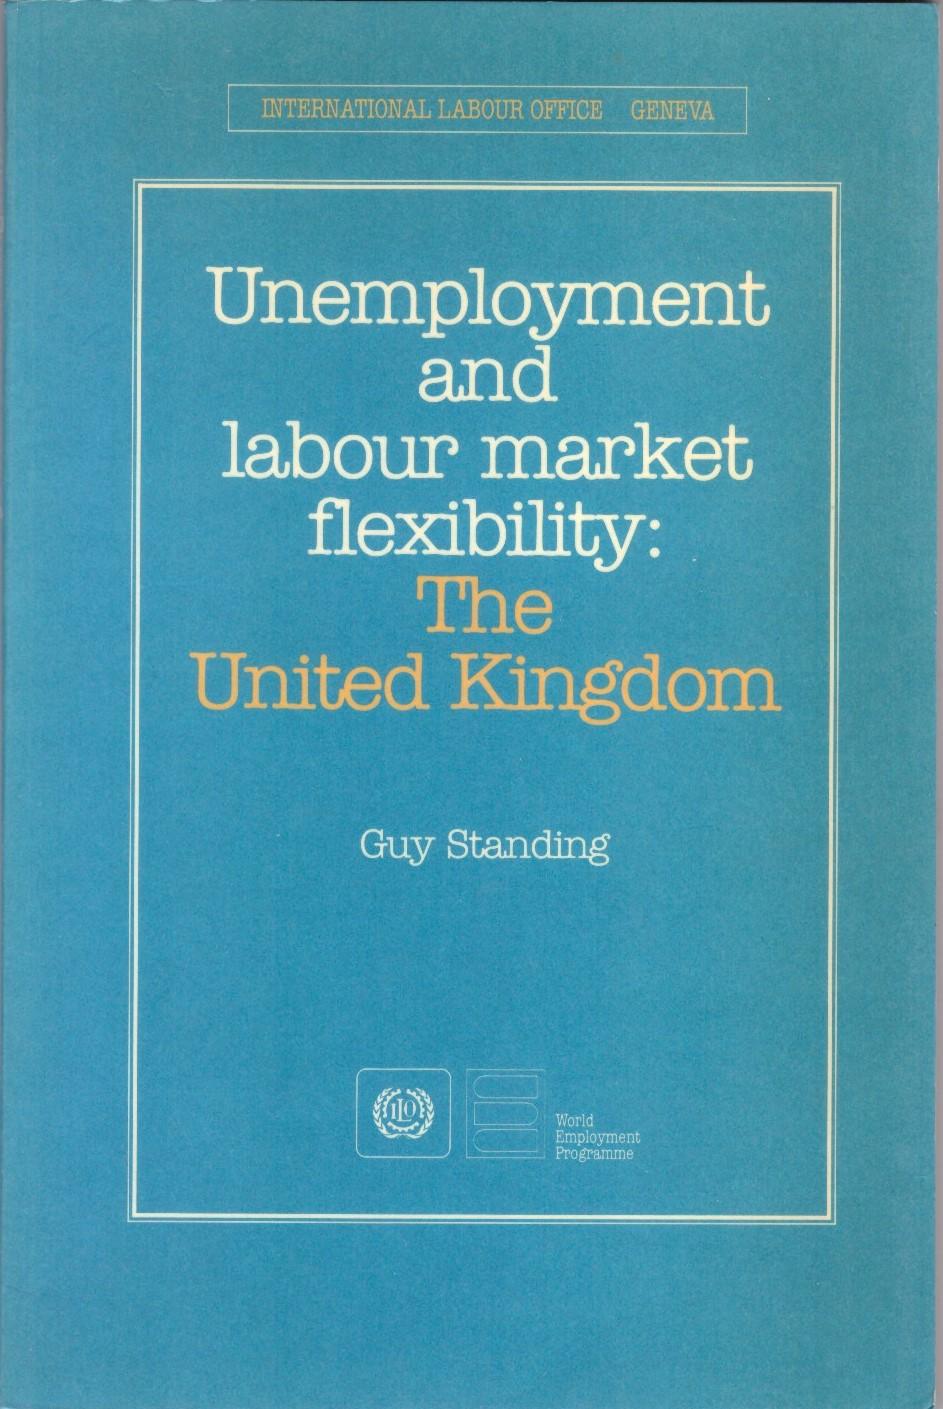 Unemployment and Labour Market Flexibility: The United Kingdom  (Geneva: ILO, 1986).   Translations   ●   Details